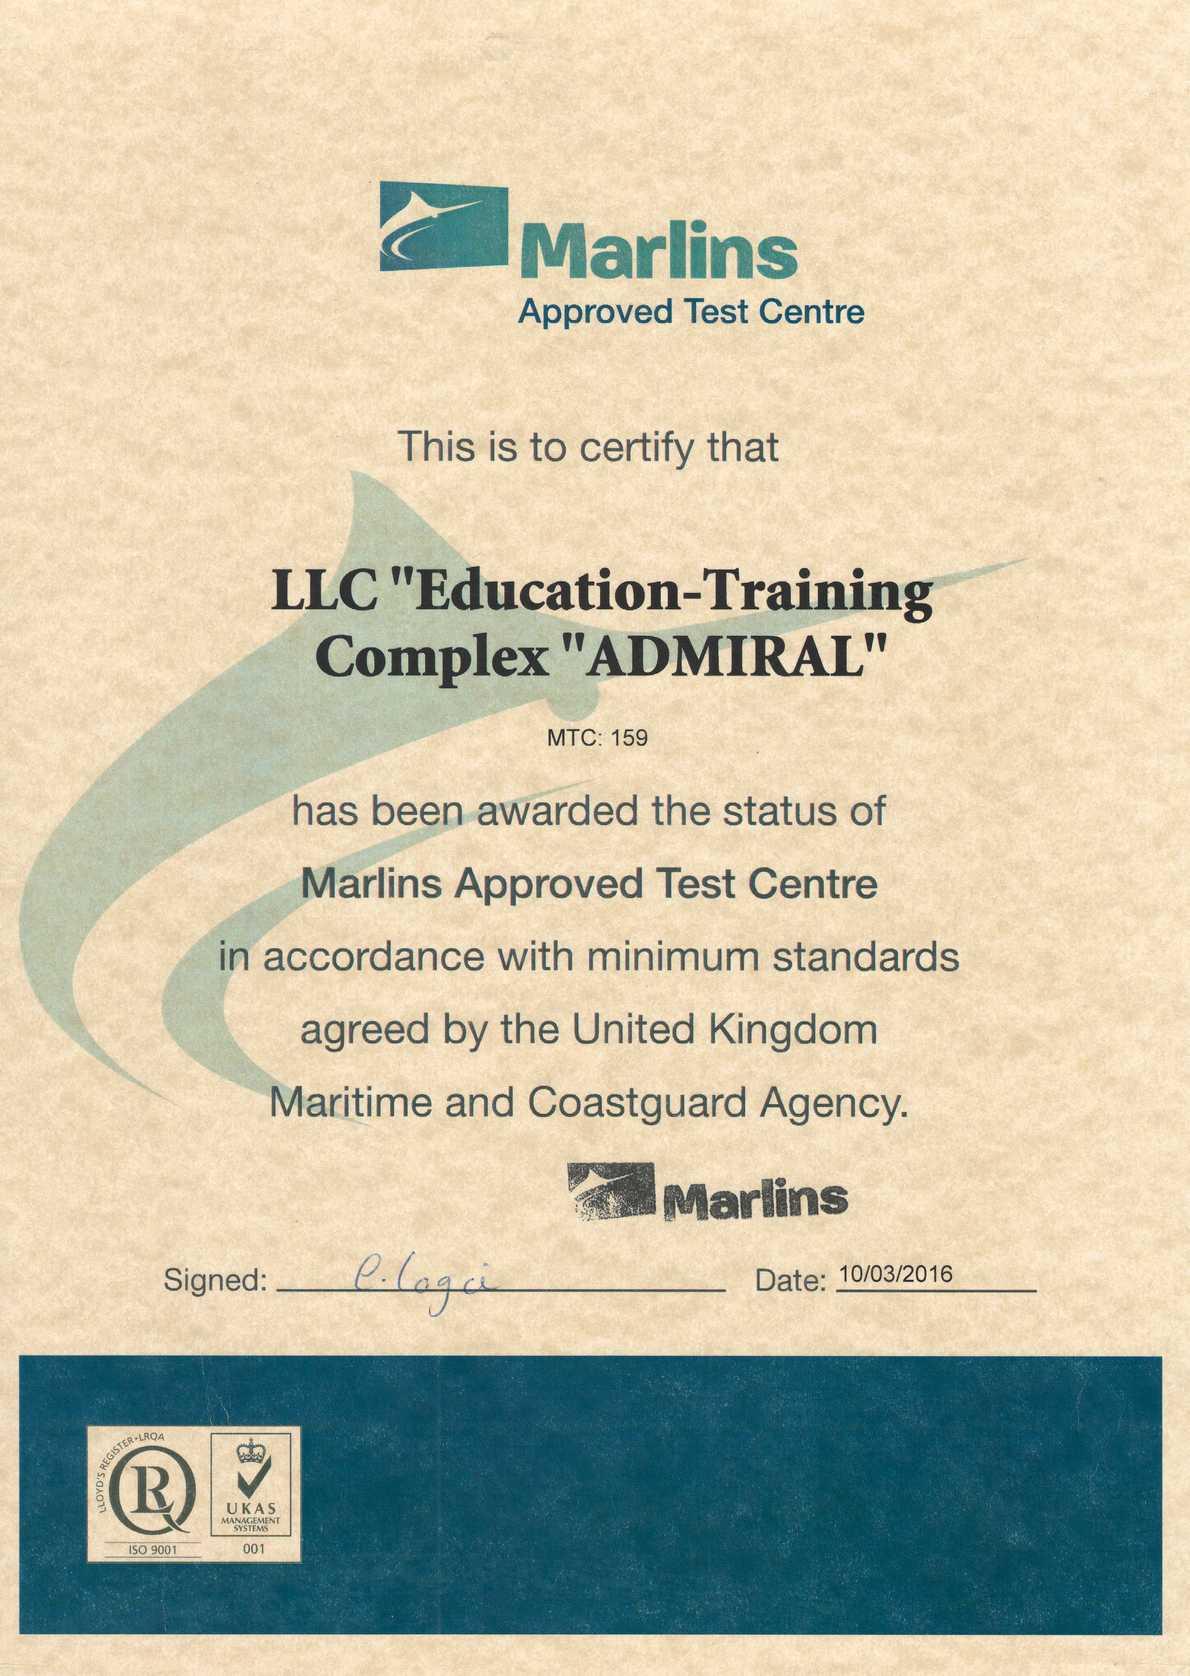 Marlins Certificate